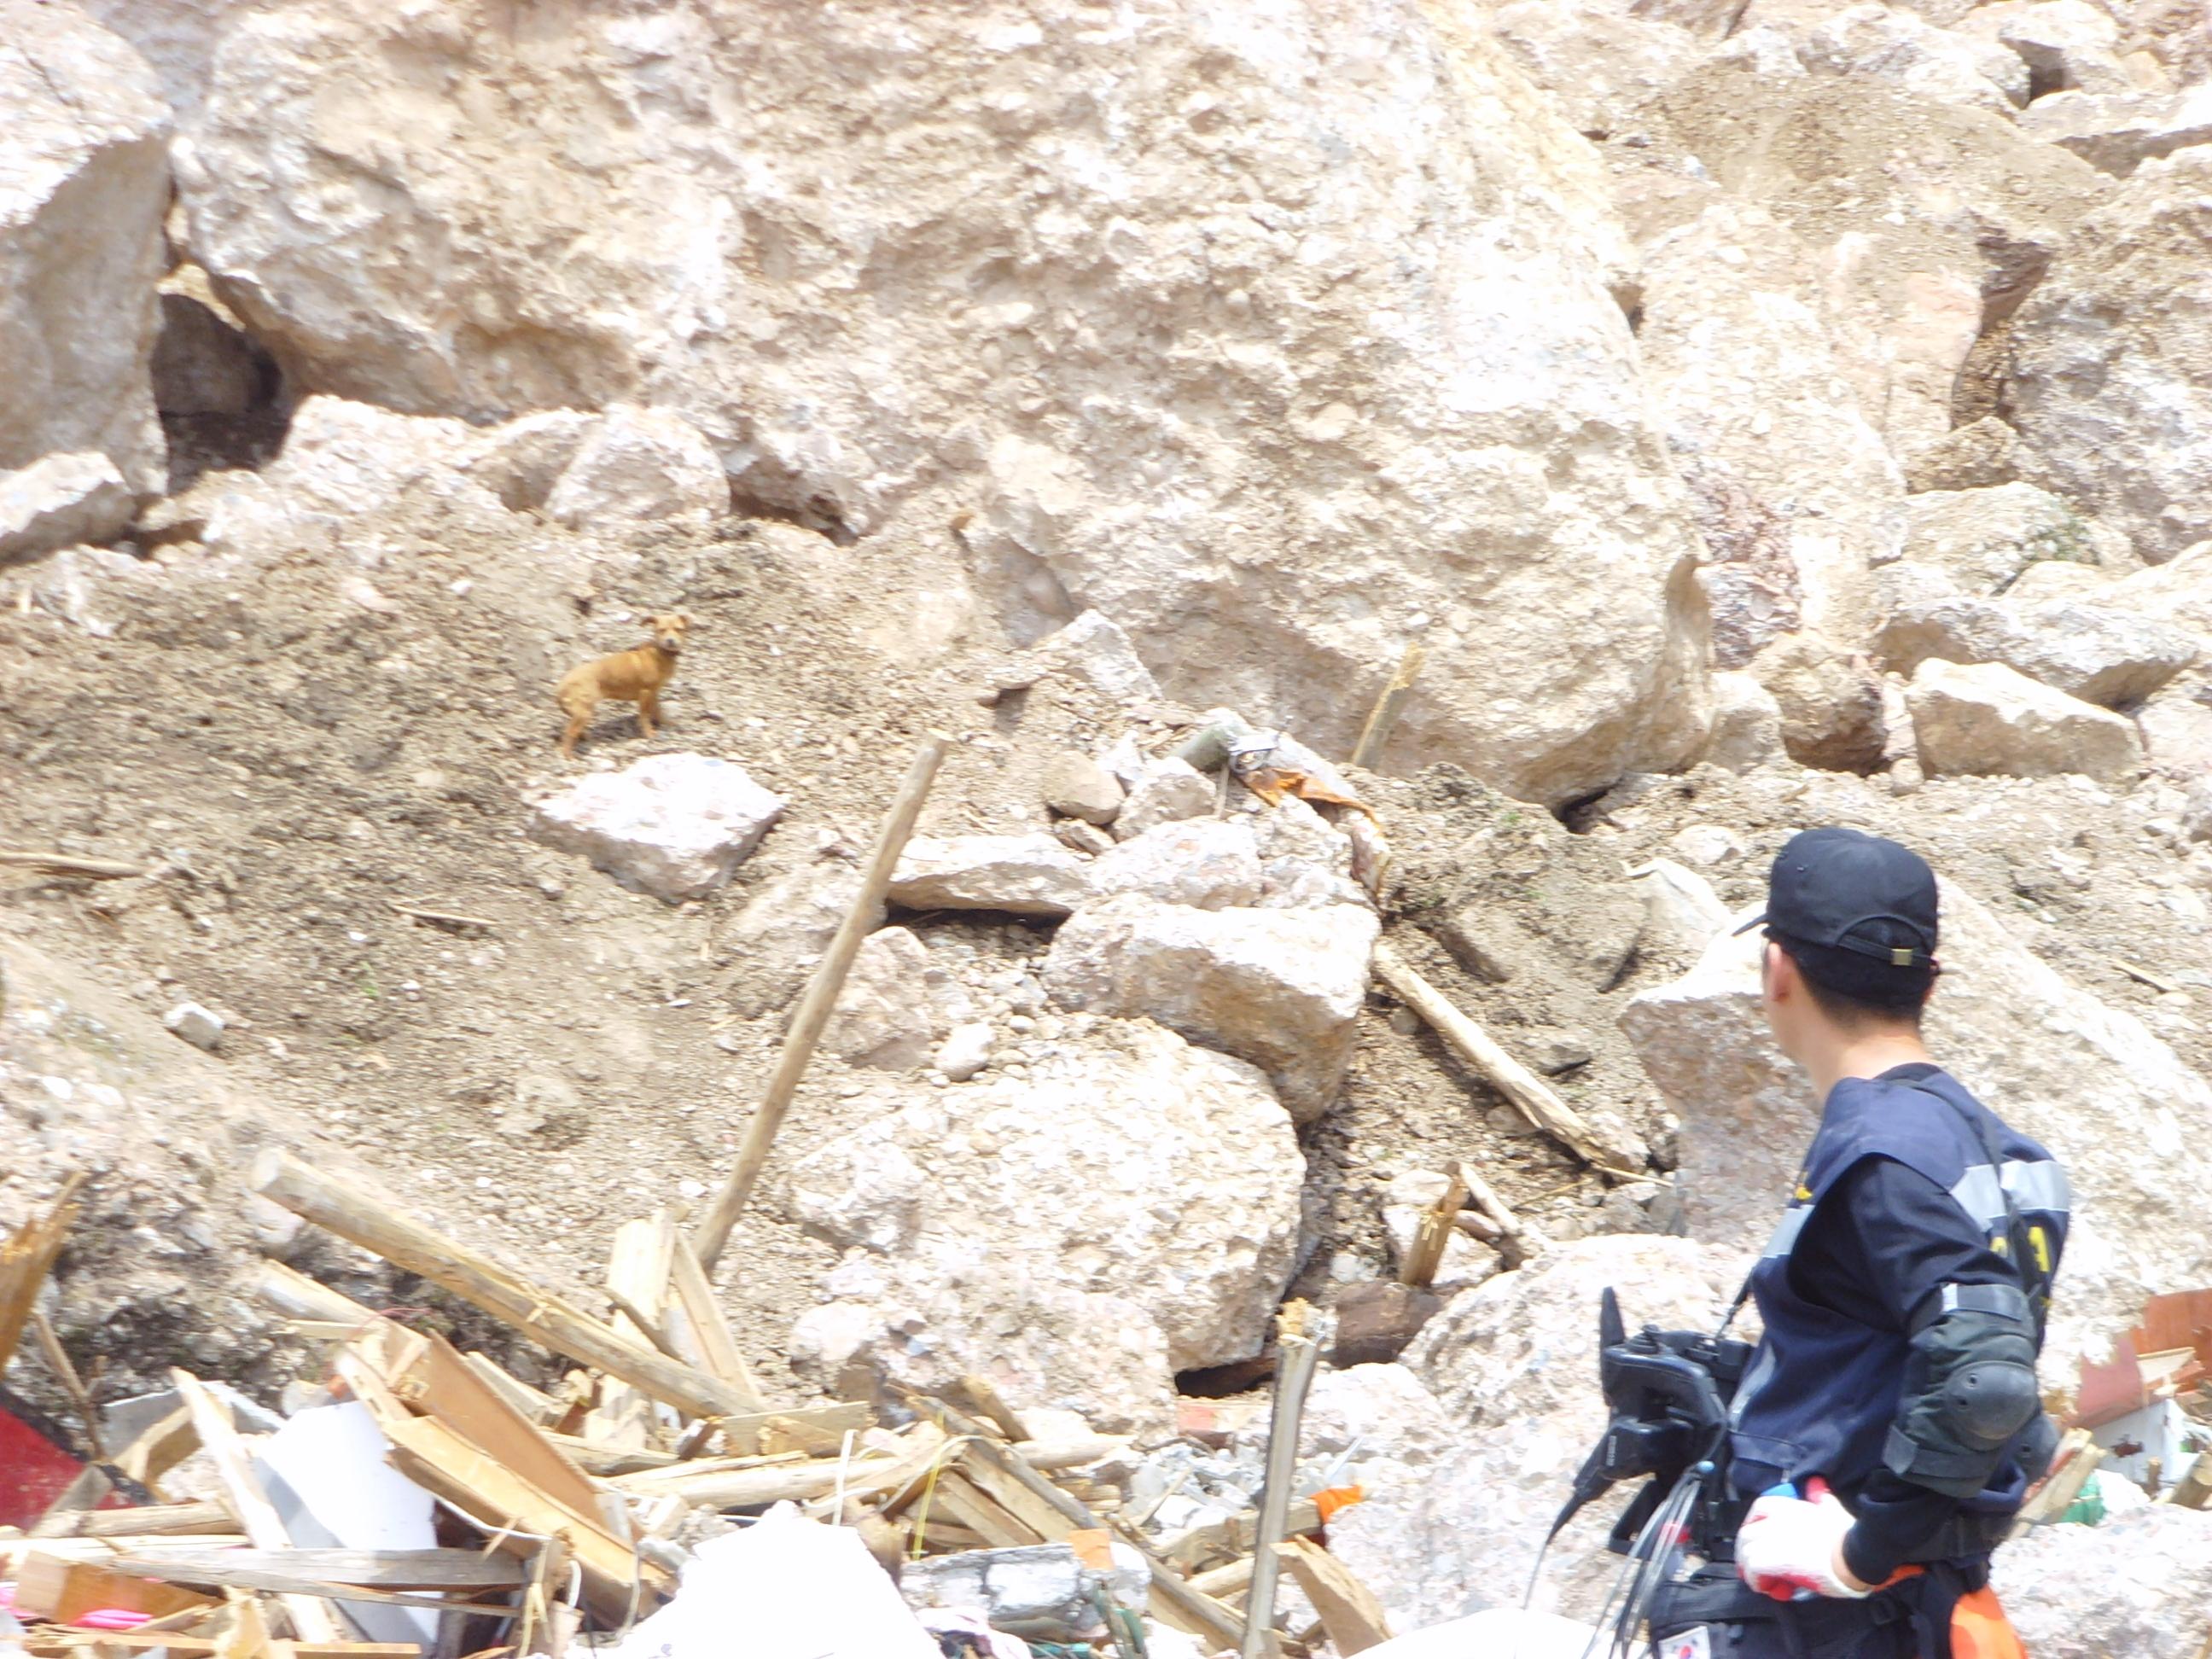 File:2008년 중앙119구조단 중국 쓰촨성 대지진 국제 출동(四川省 大地震. 사천성 대지진) SSL26931.JPG - Wikimedia Commons